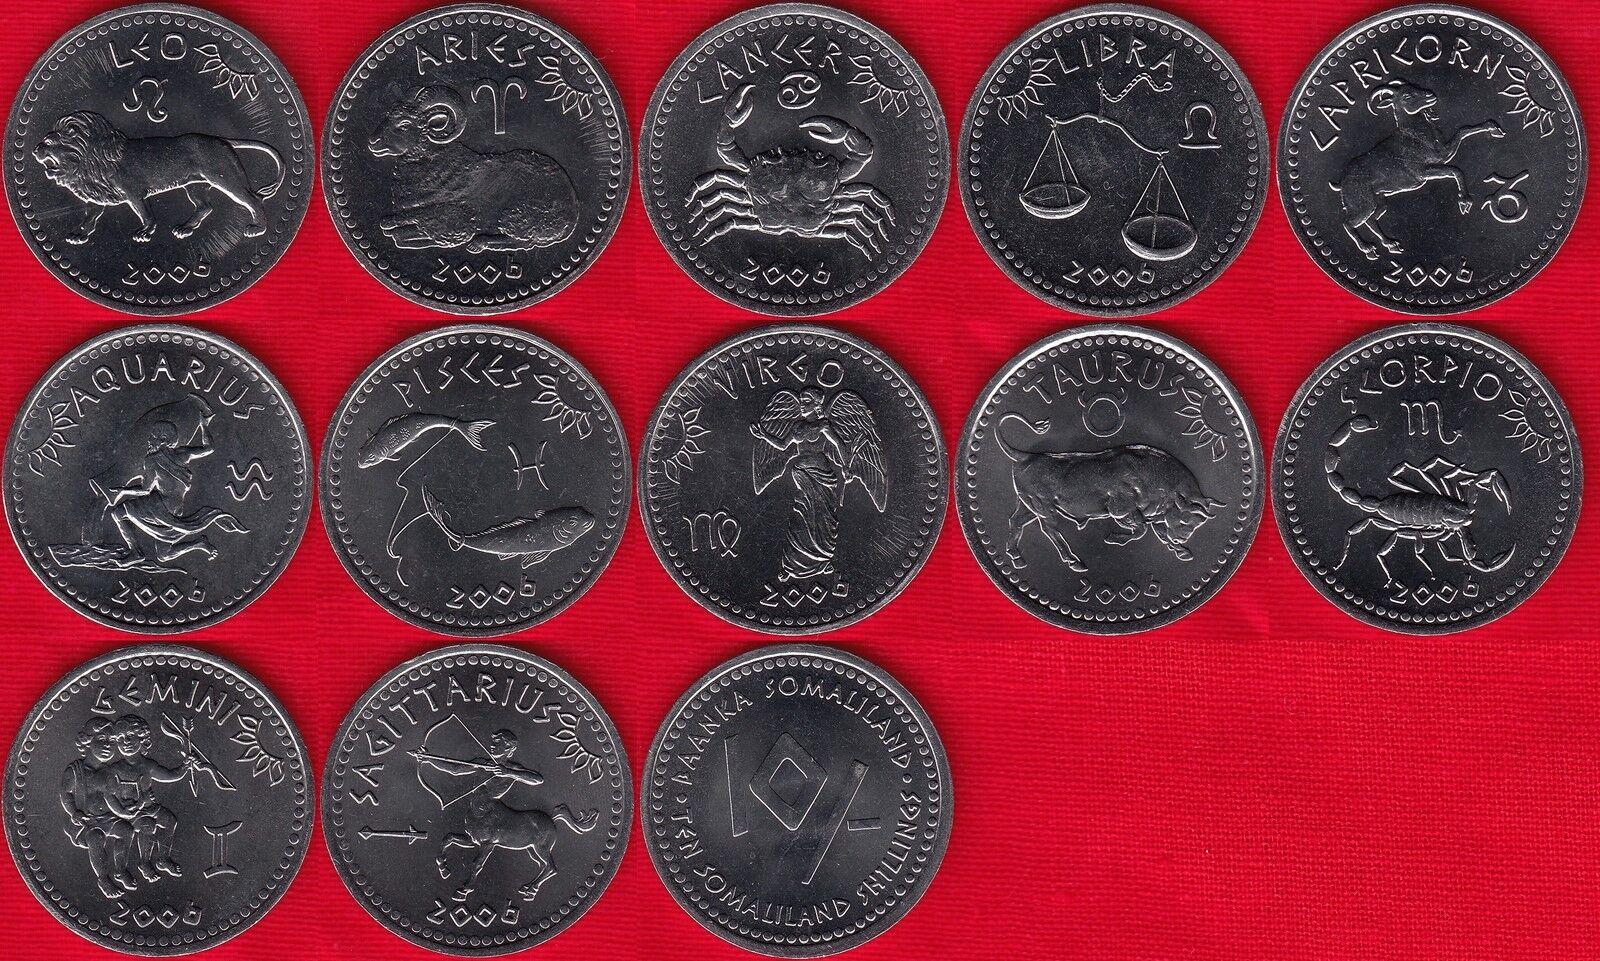 2006 Zodiac serial,real S-3 10 shillings UNC Somaliland Set 12 Coins